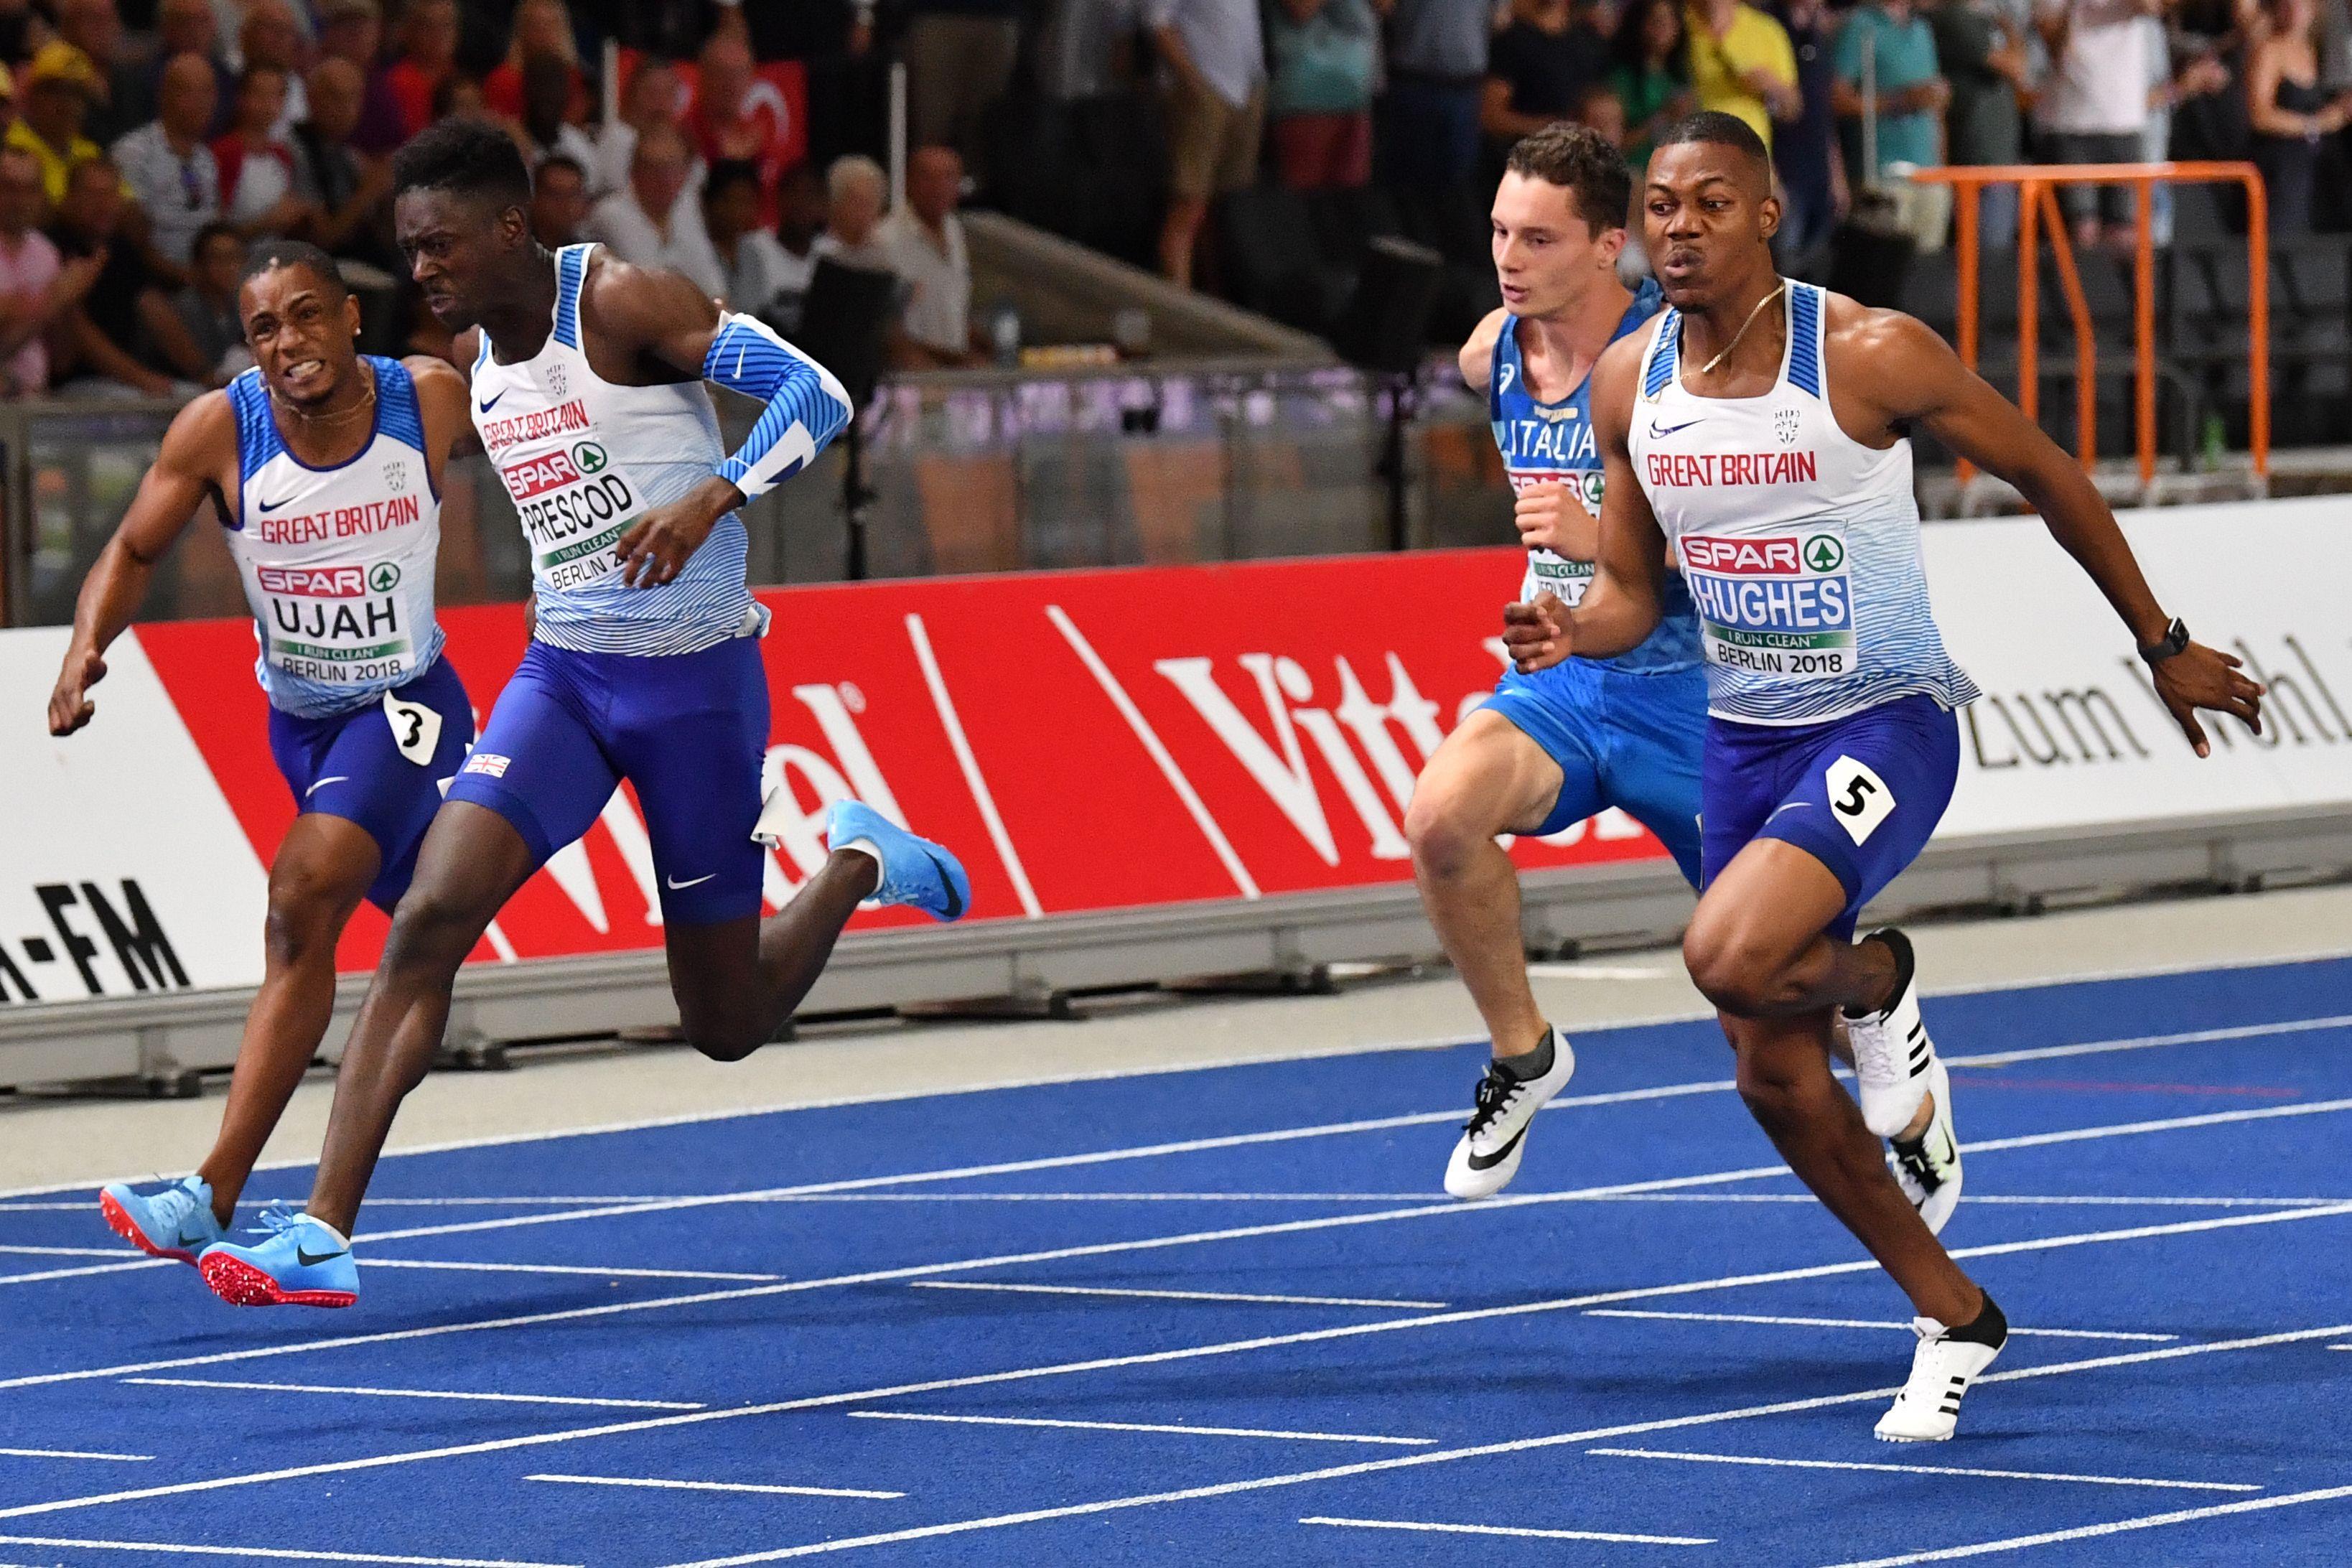 Hughes and Prescod ran an incredibly exciting European 100m final